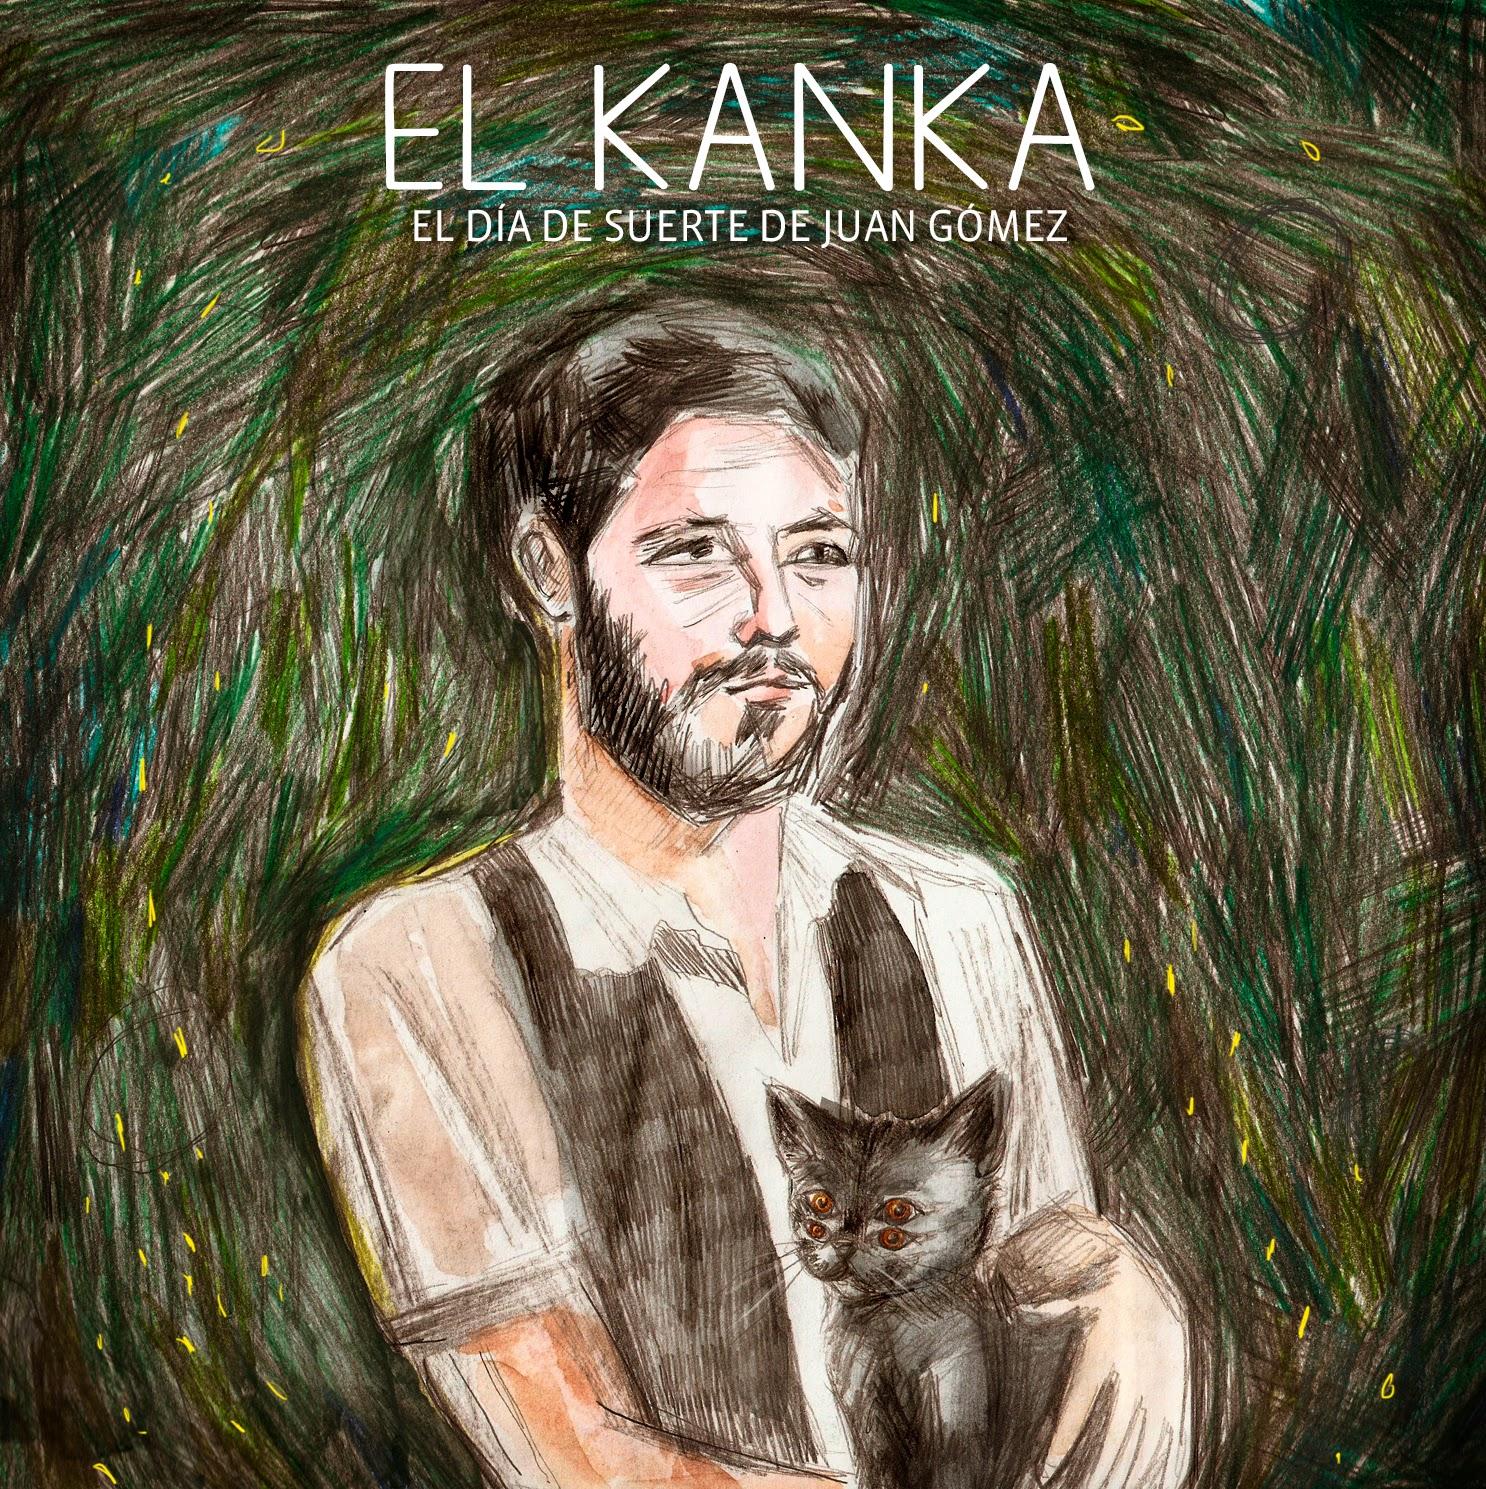 El Kanka el dia de suerte de Juan Gómez